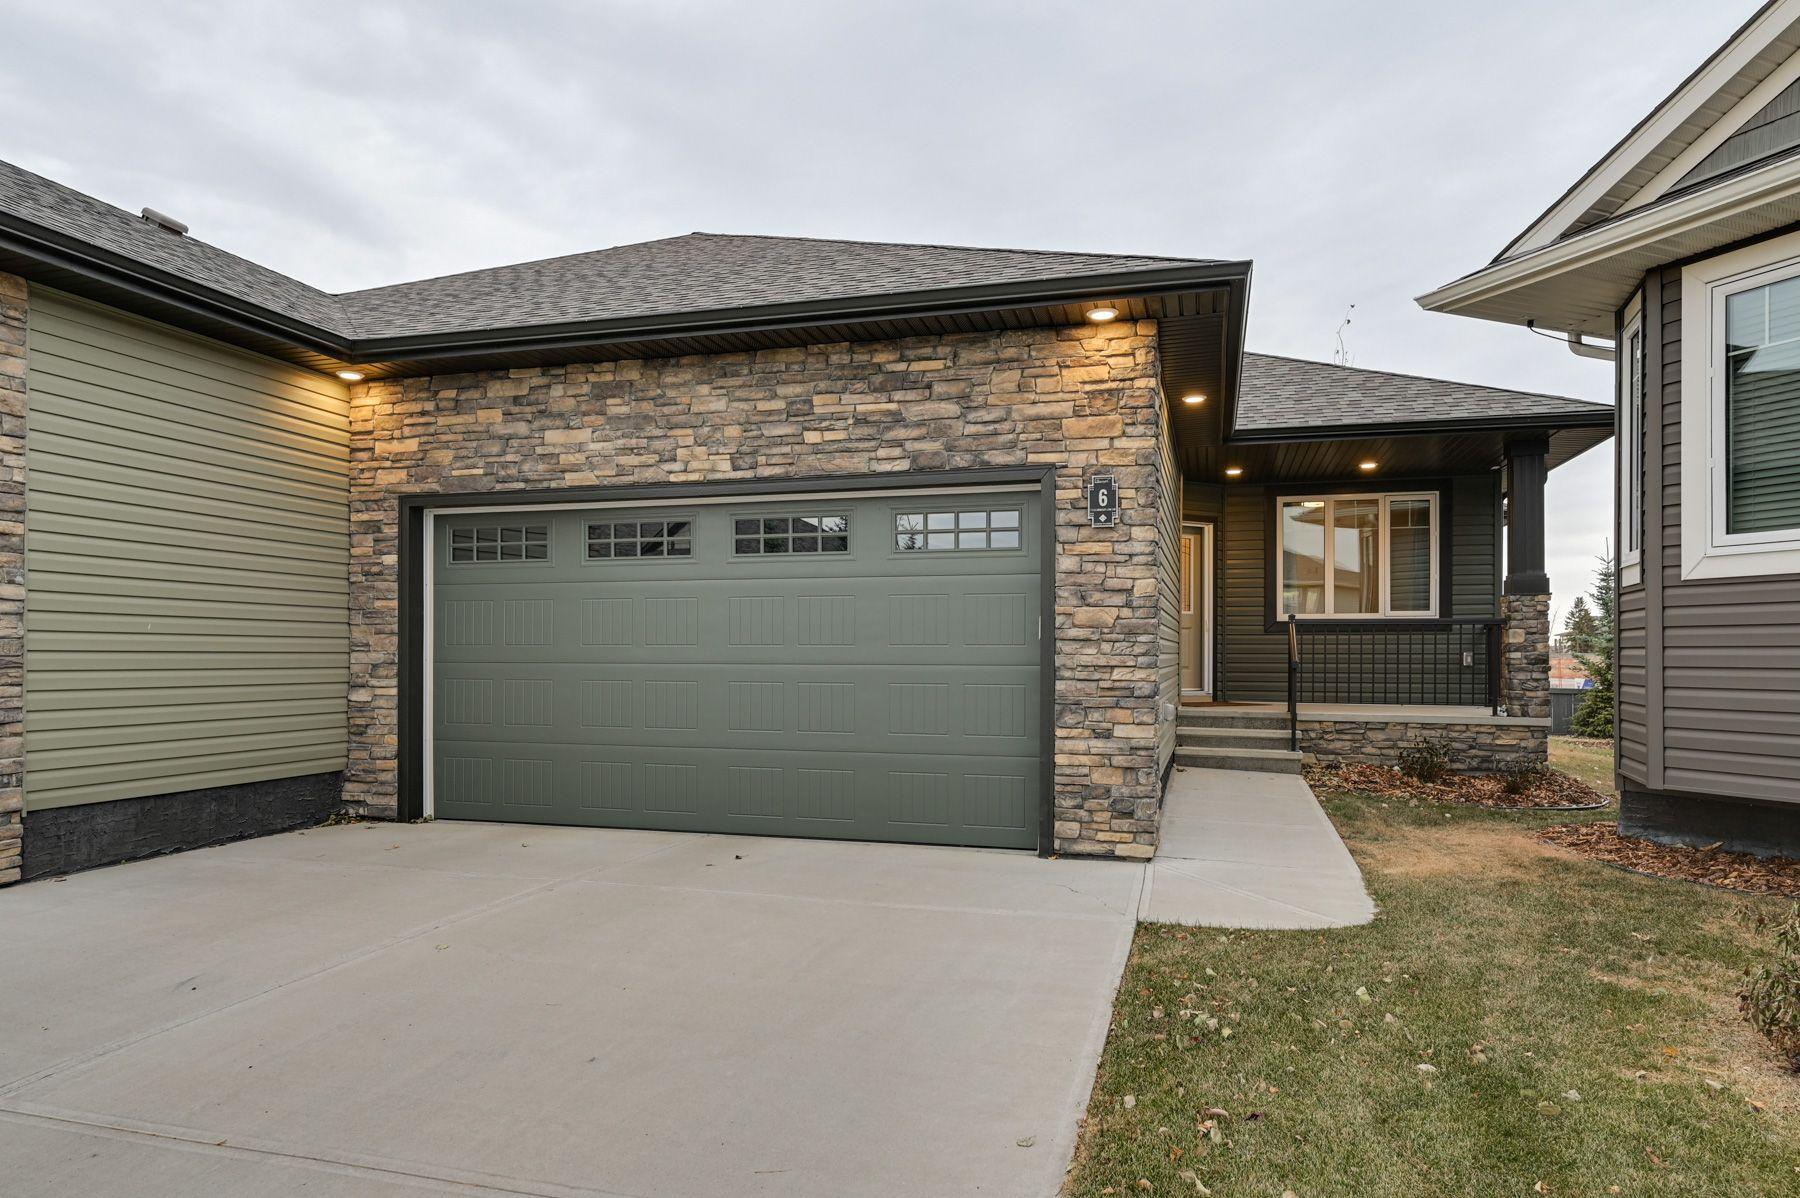 Main Photo: #6, 7115 Armour Link: Edmonton House Half Duplex for sale : MLS®# E4219991